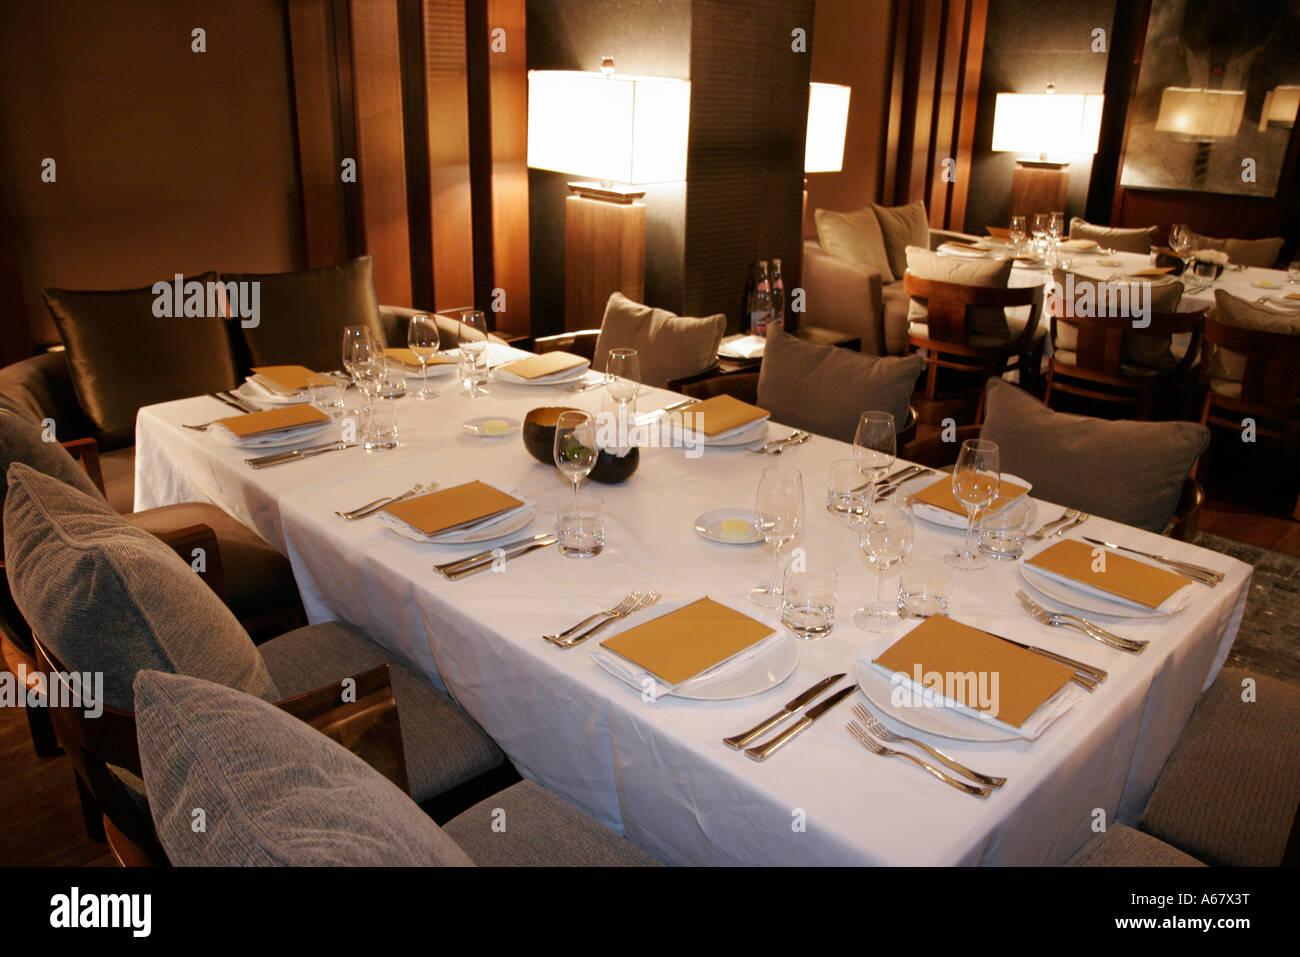 miami beach florida south beach setai hotel restaurant. Black Bedroom Furniture Sets. Home Design Ideas